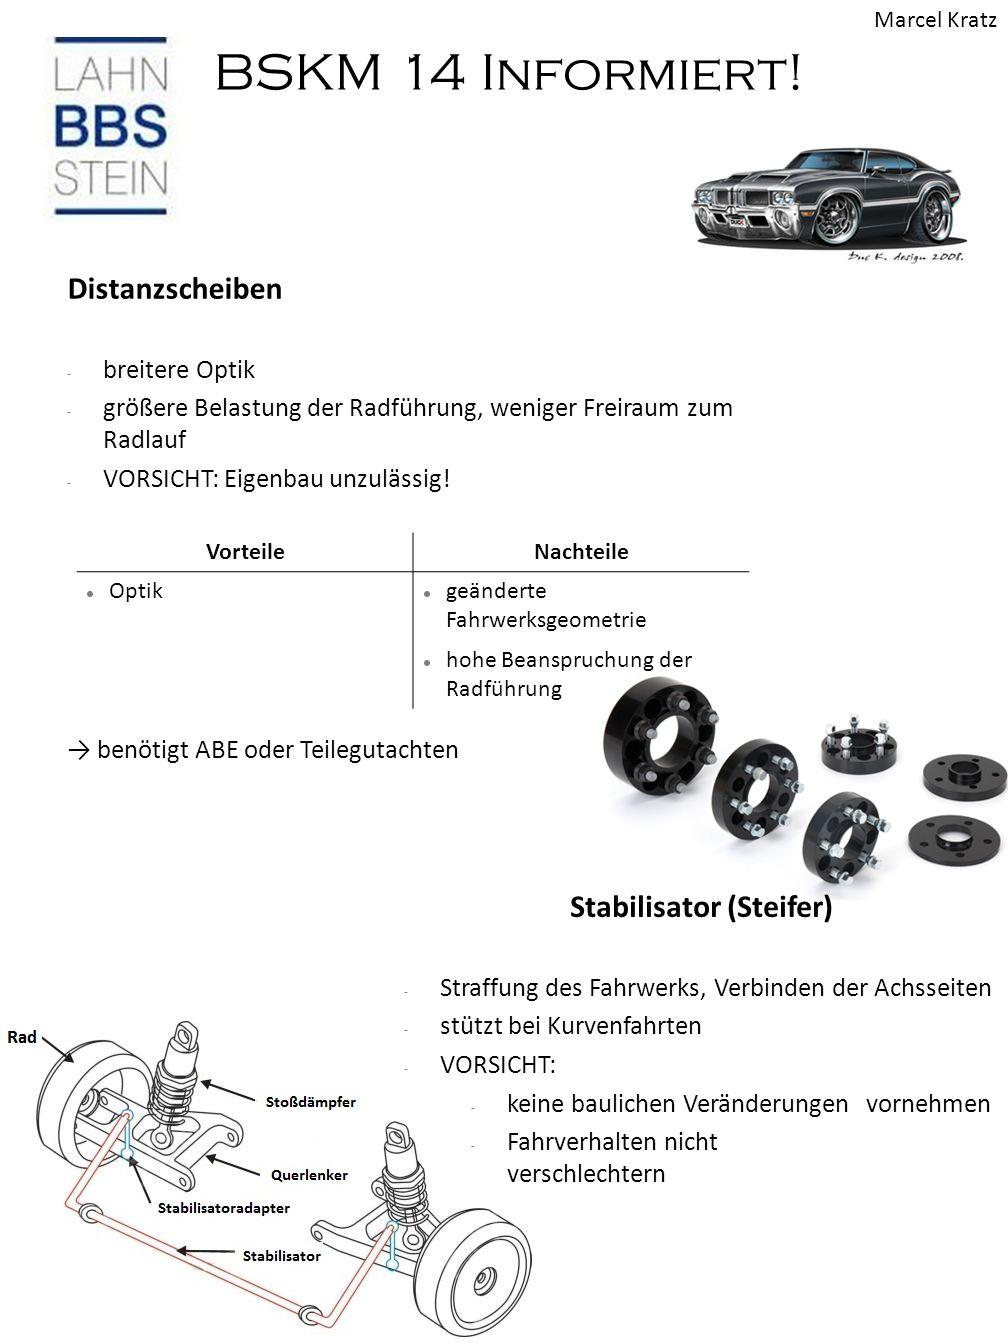 Stabilisator (Steifer)